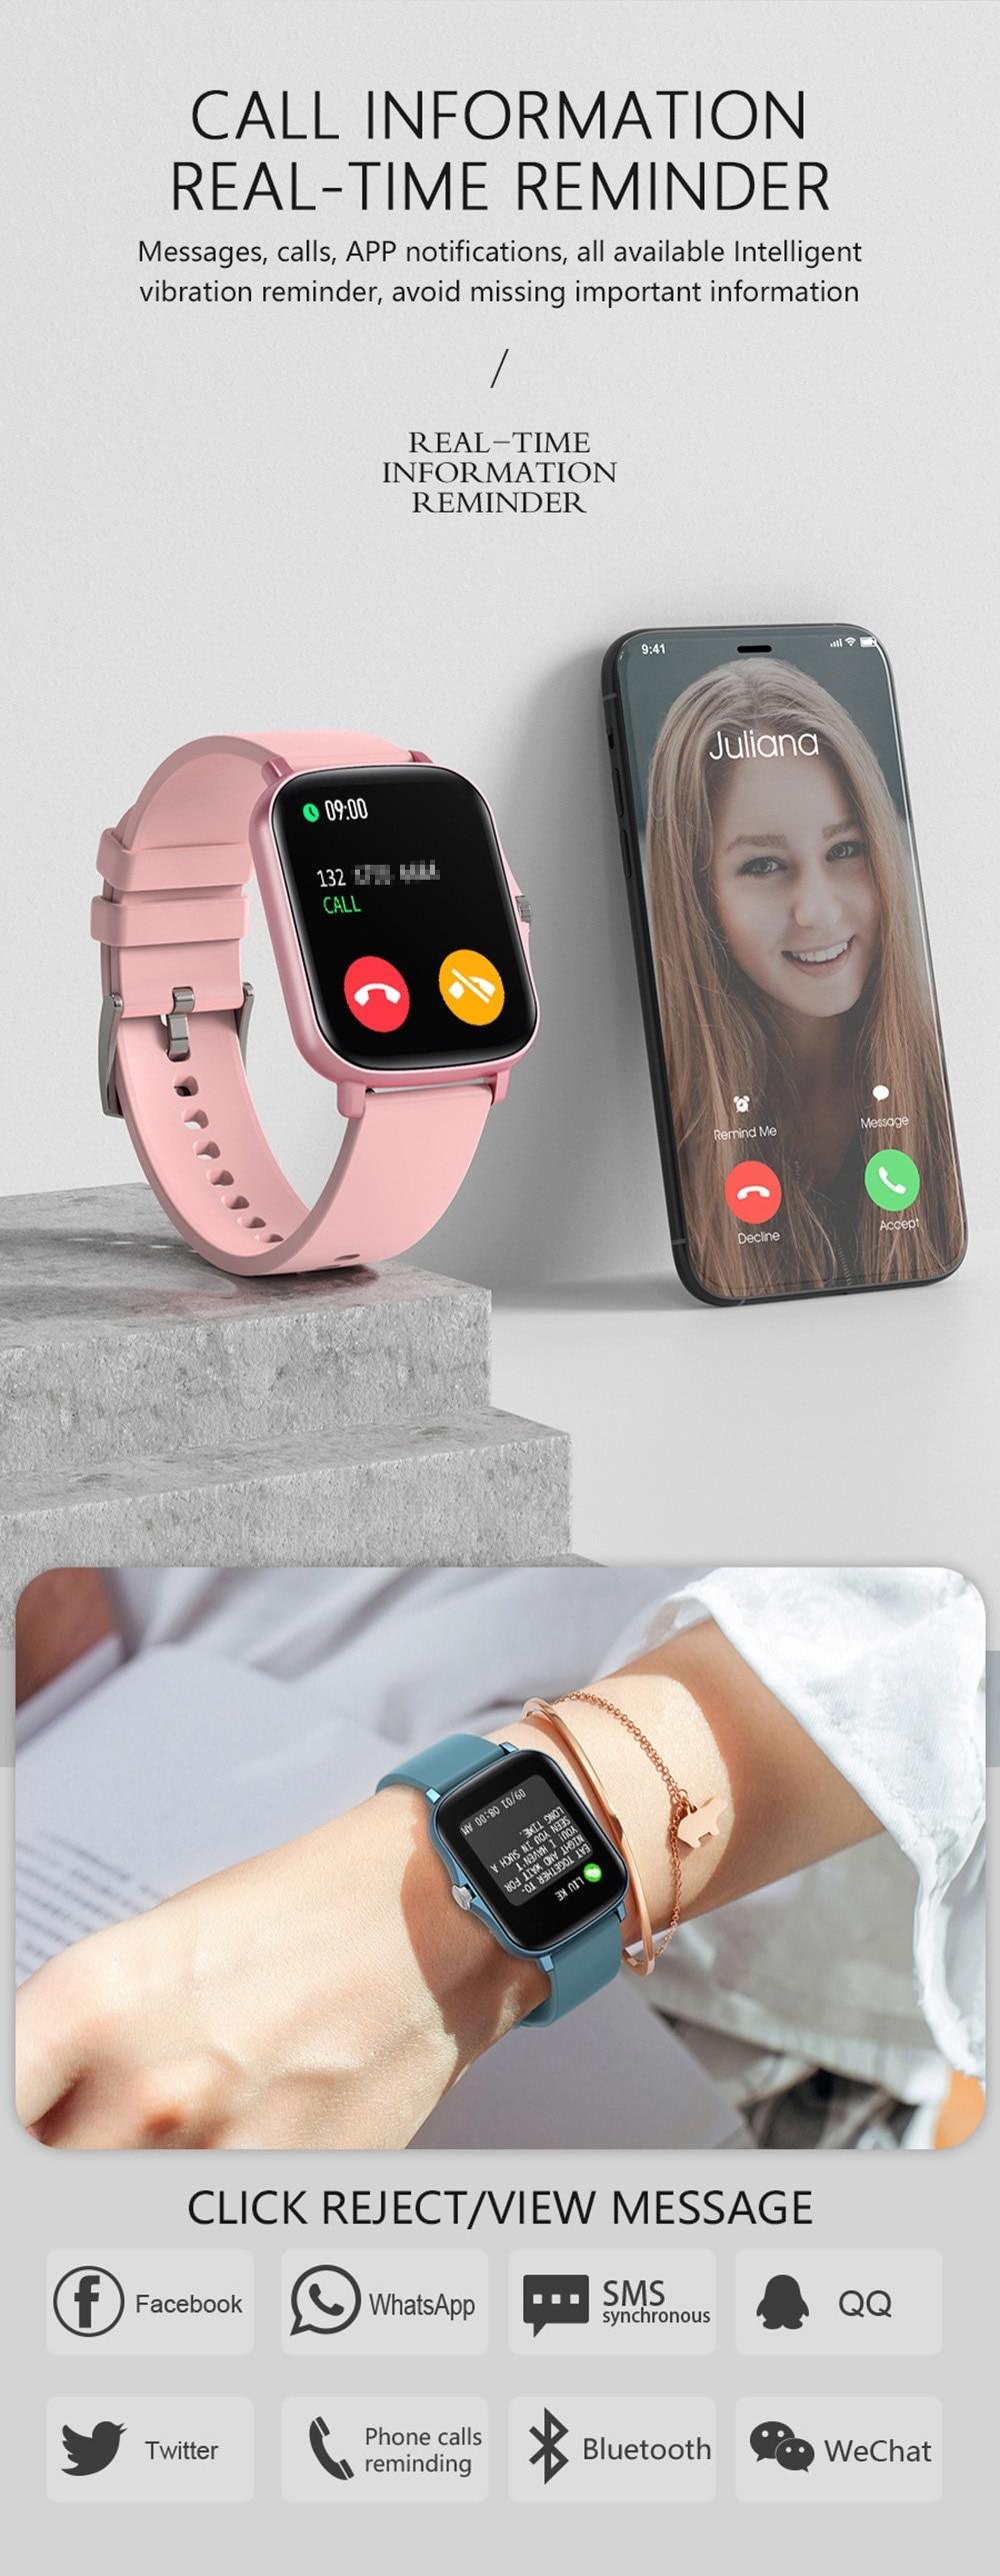 Hb821fb8612f541919ee836e1fa4733755 COLMI P8 Plus 1.69 inch 2021 Smart Watch Men Full Touch Fitness Tracker IP67 waterproof Women GTS 2 Smartwatch for Xiaomi phone